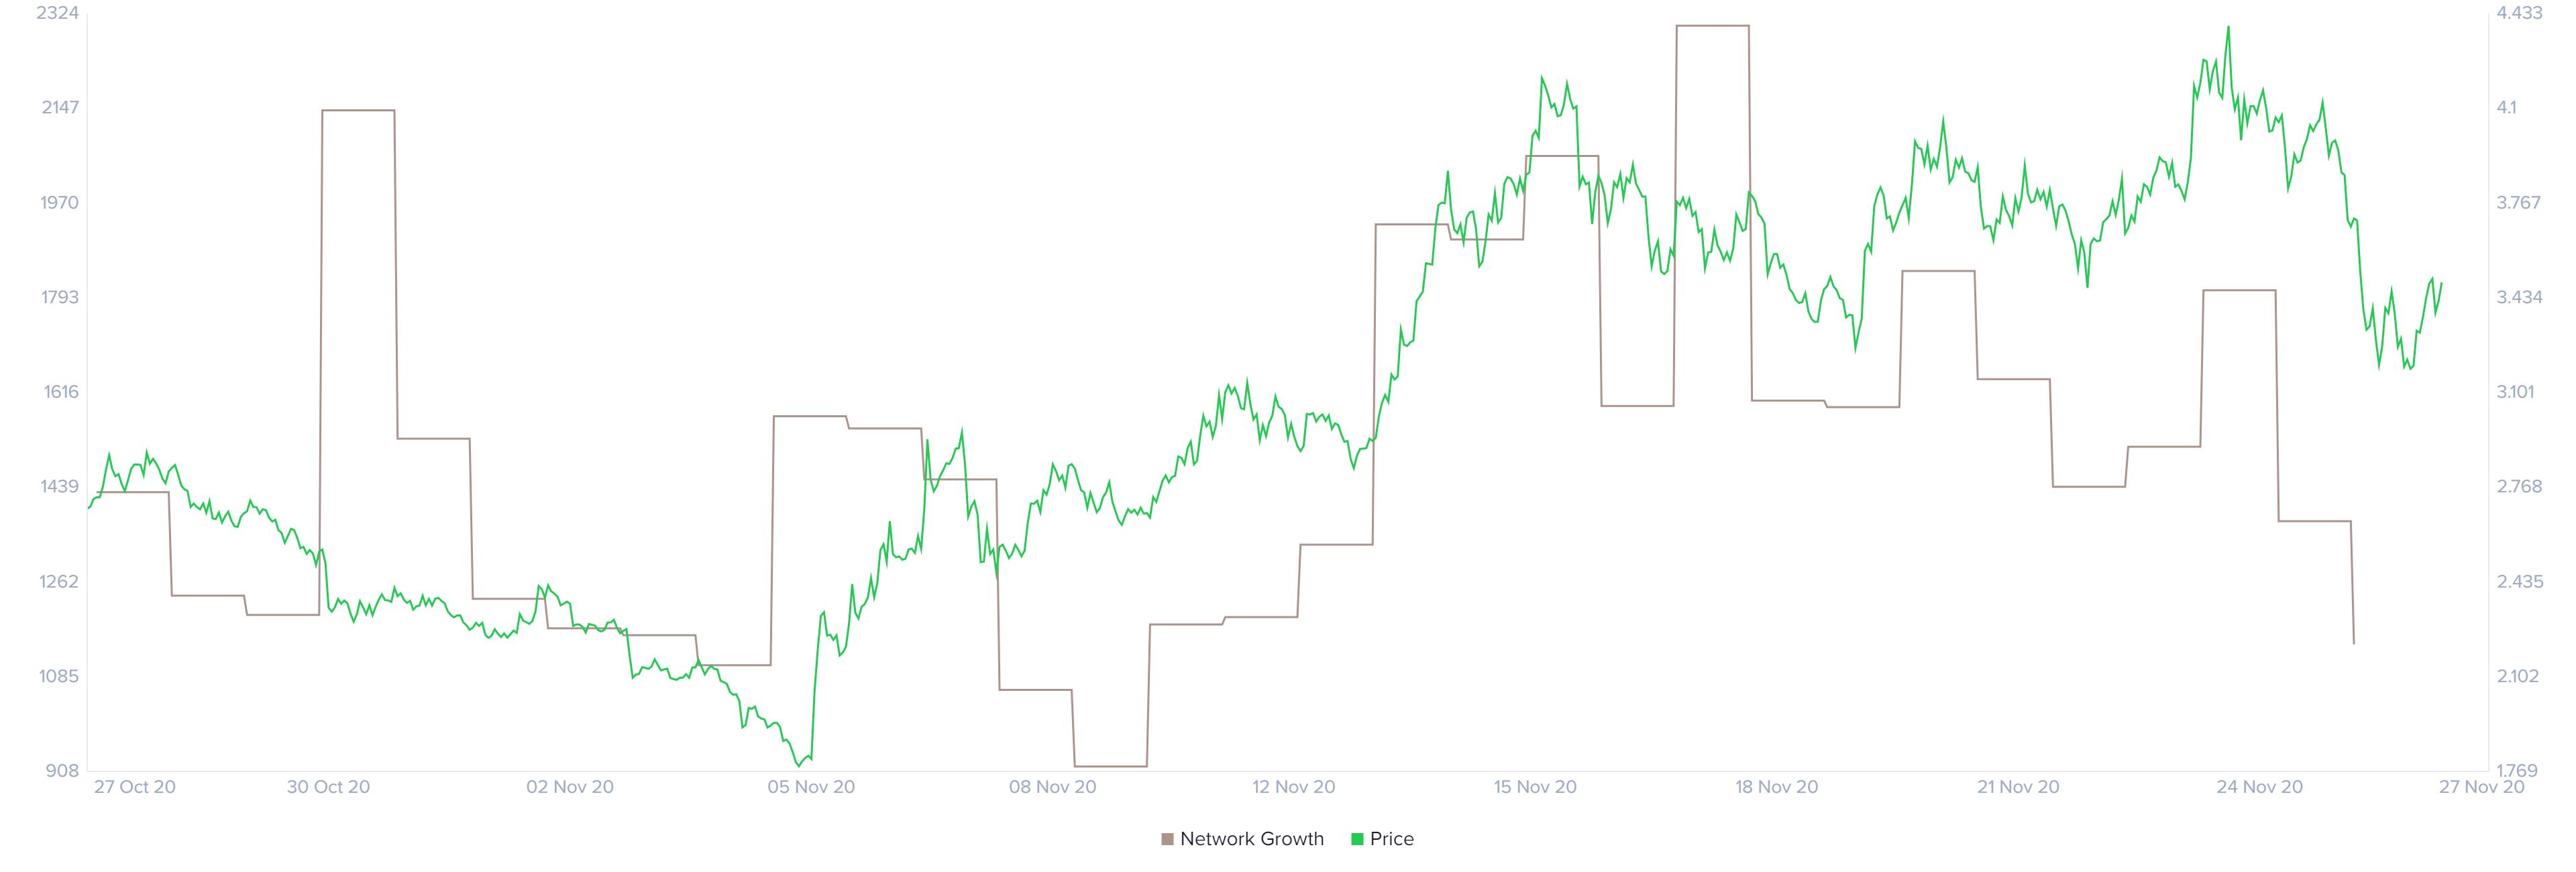 Uniswap network growth